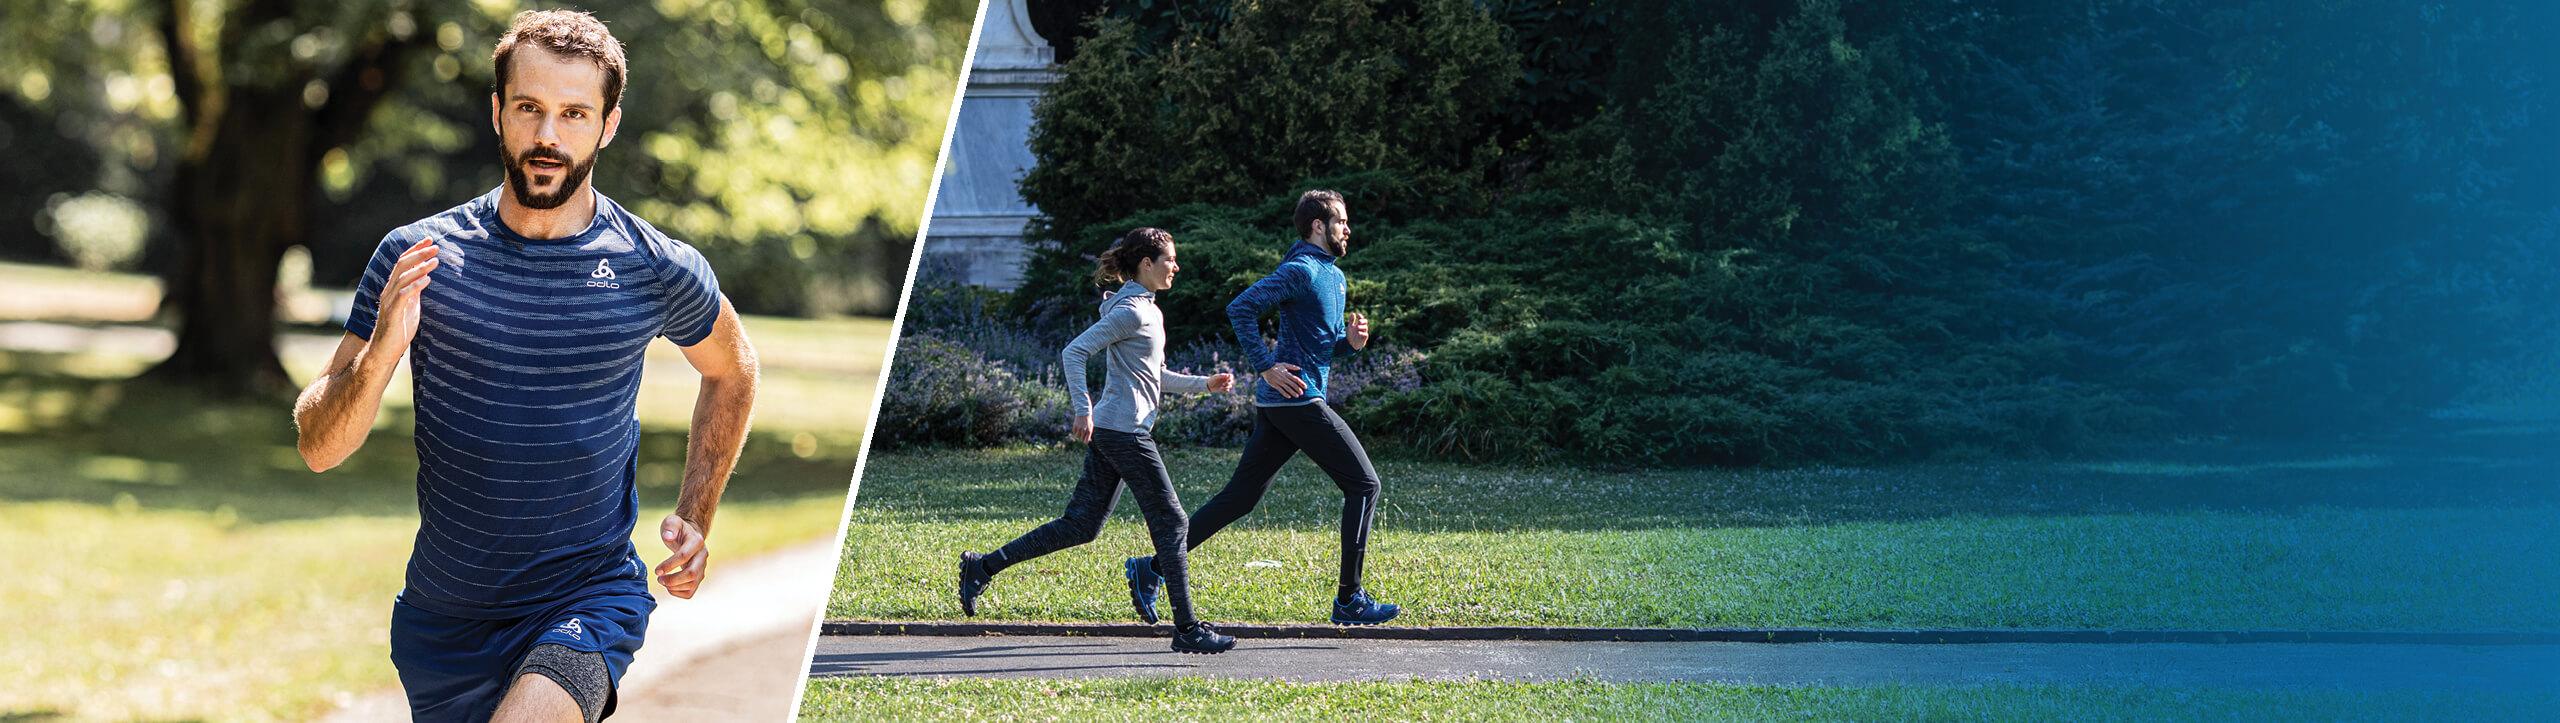 Men running collection Spring - Summer 2020